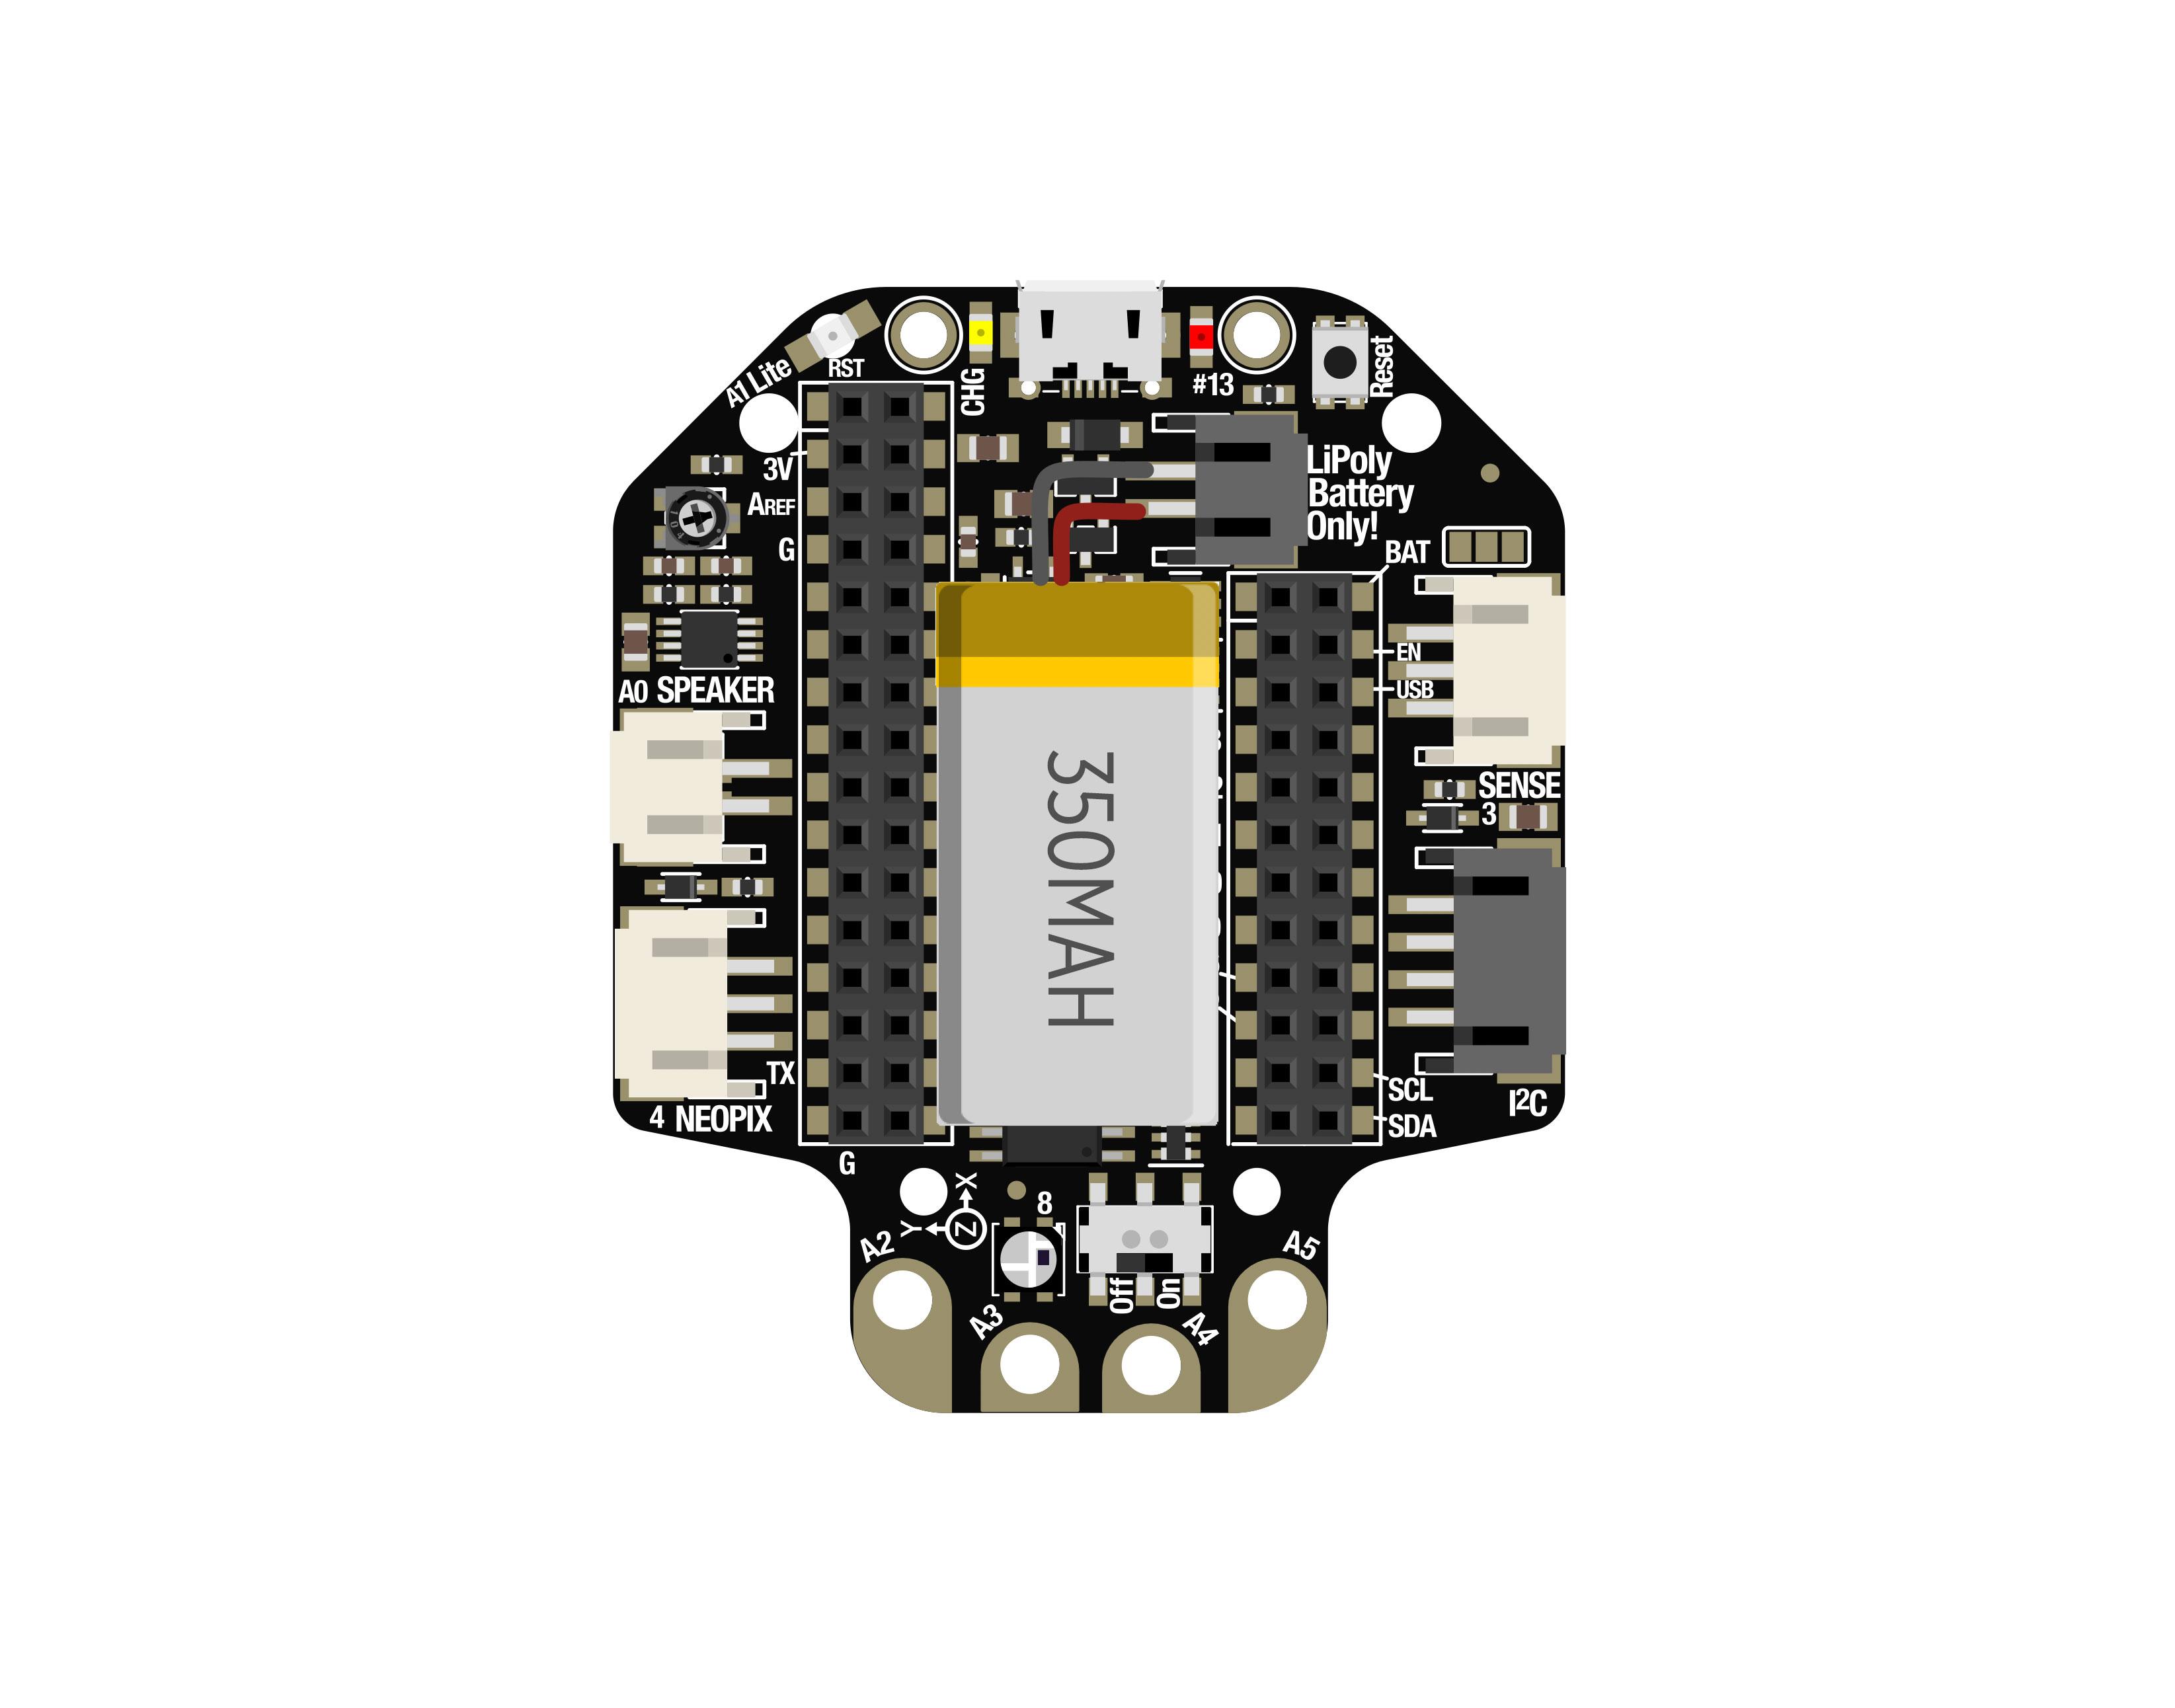 lcds___displays_circuit-diagram.jpg